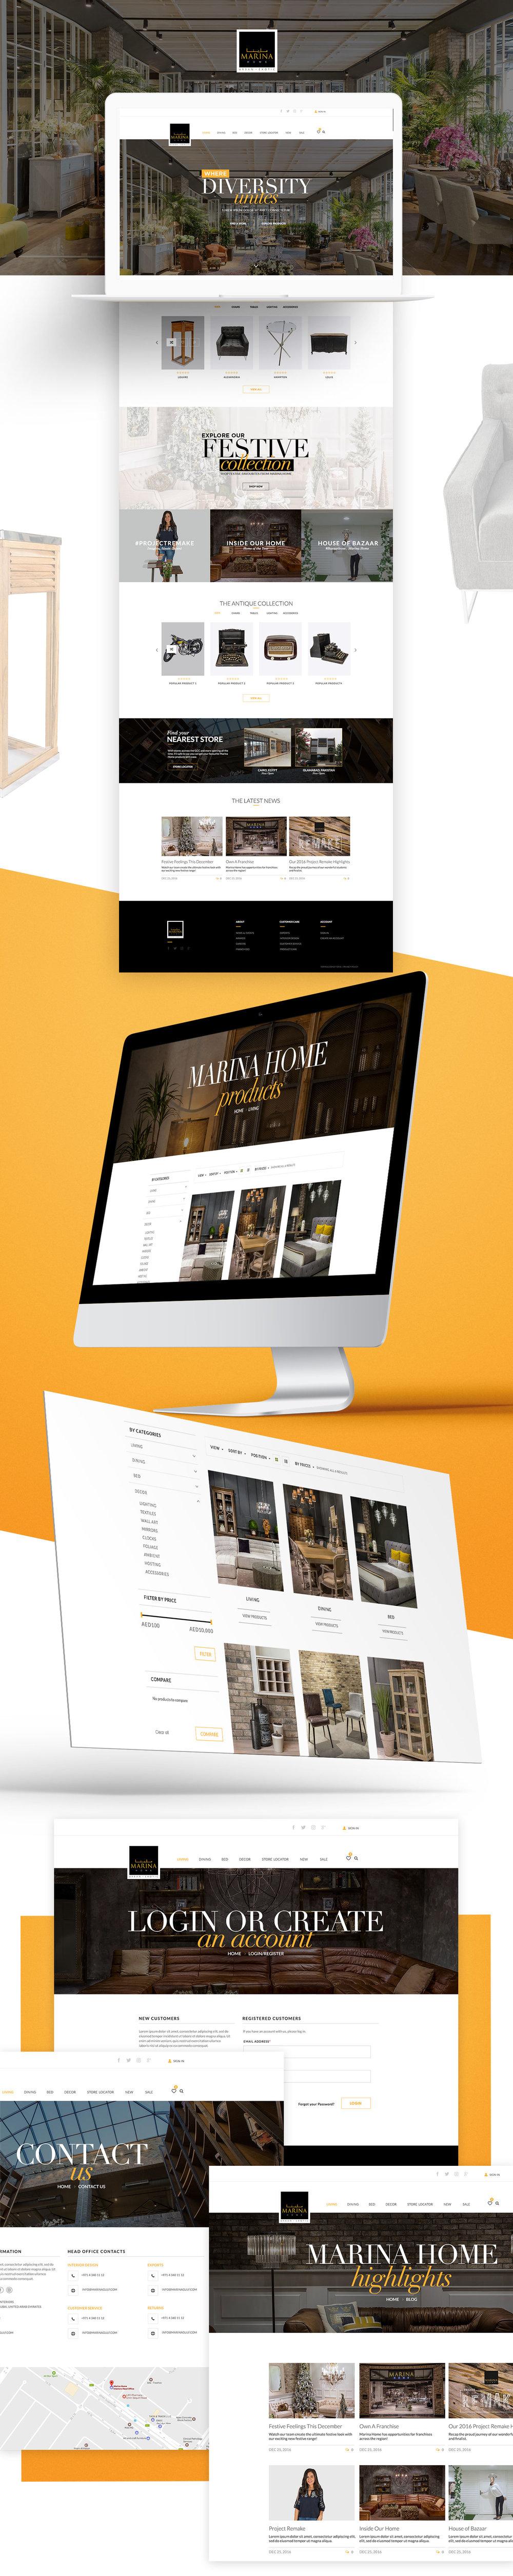 marina home website valerie sandoval